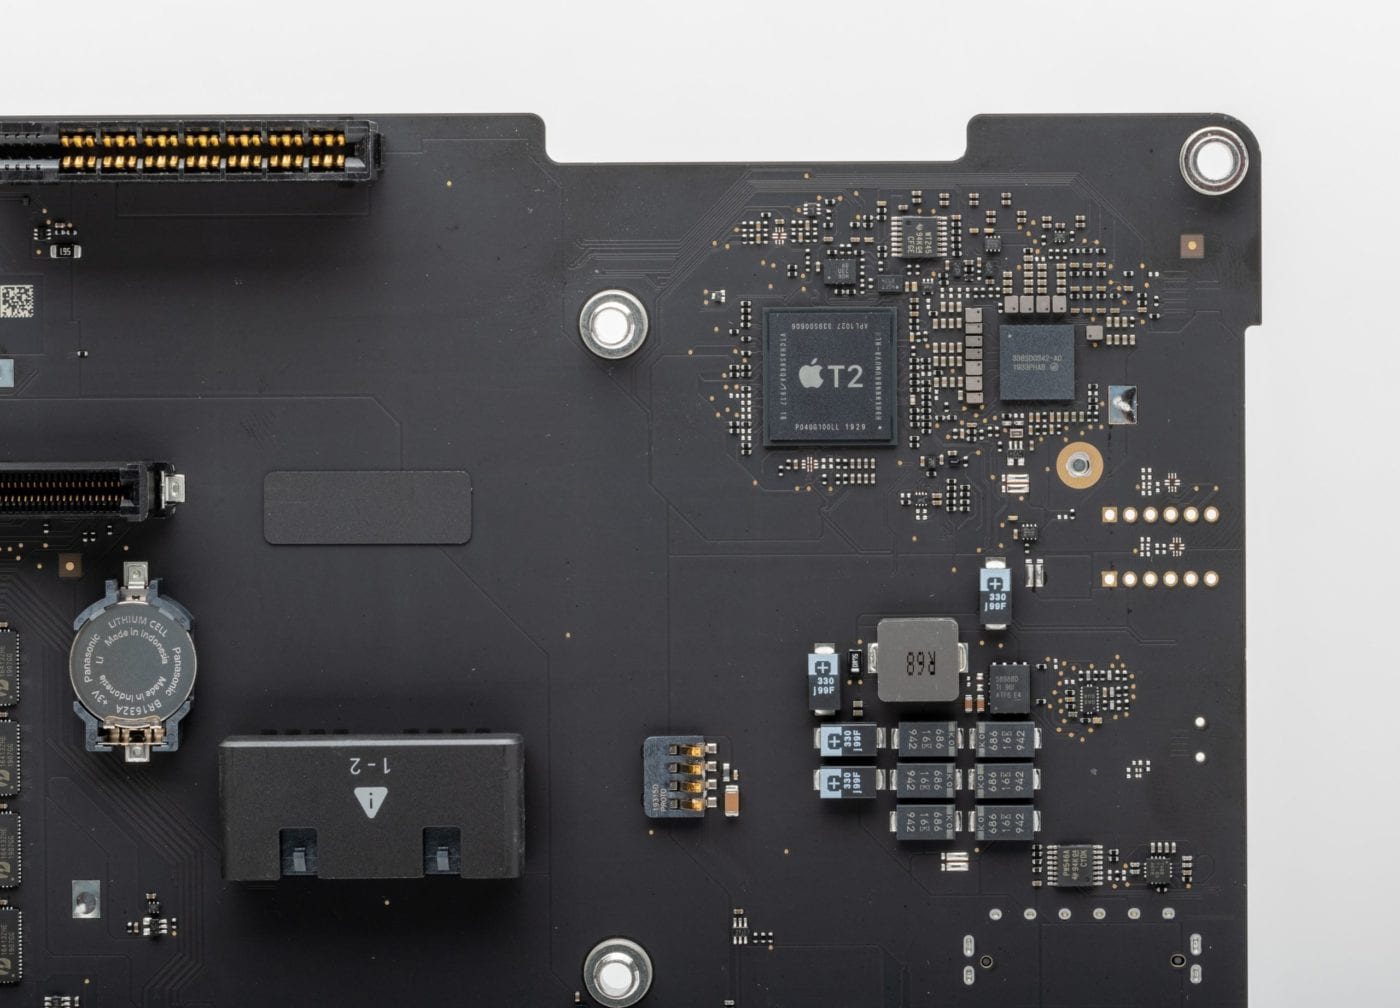 2019 Mac Pro – Close up of Apple T2 chip